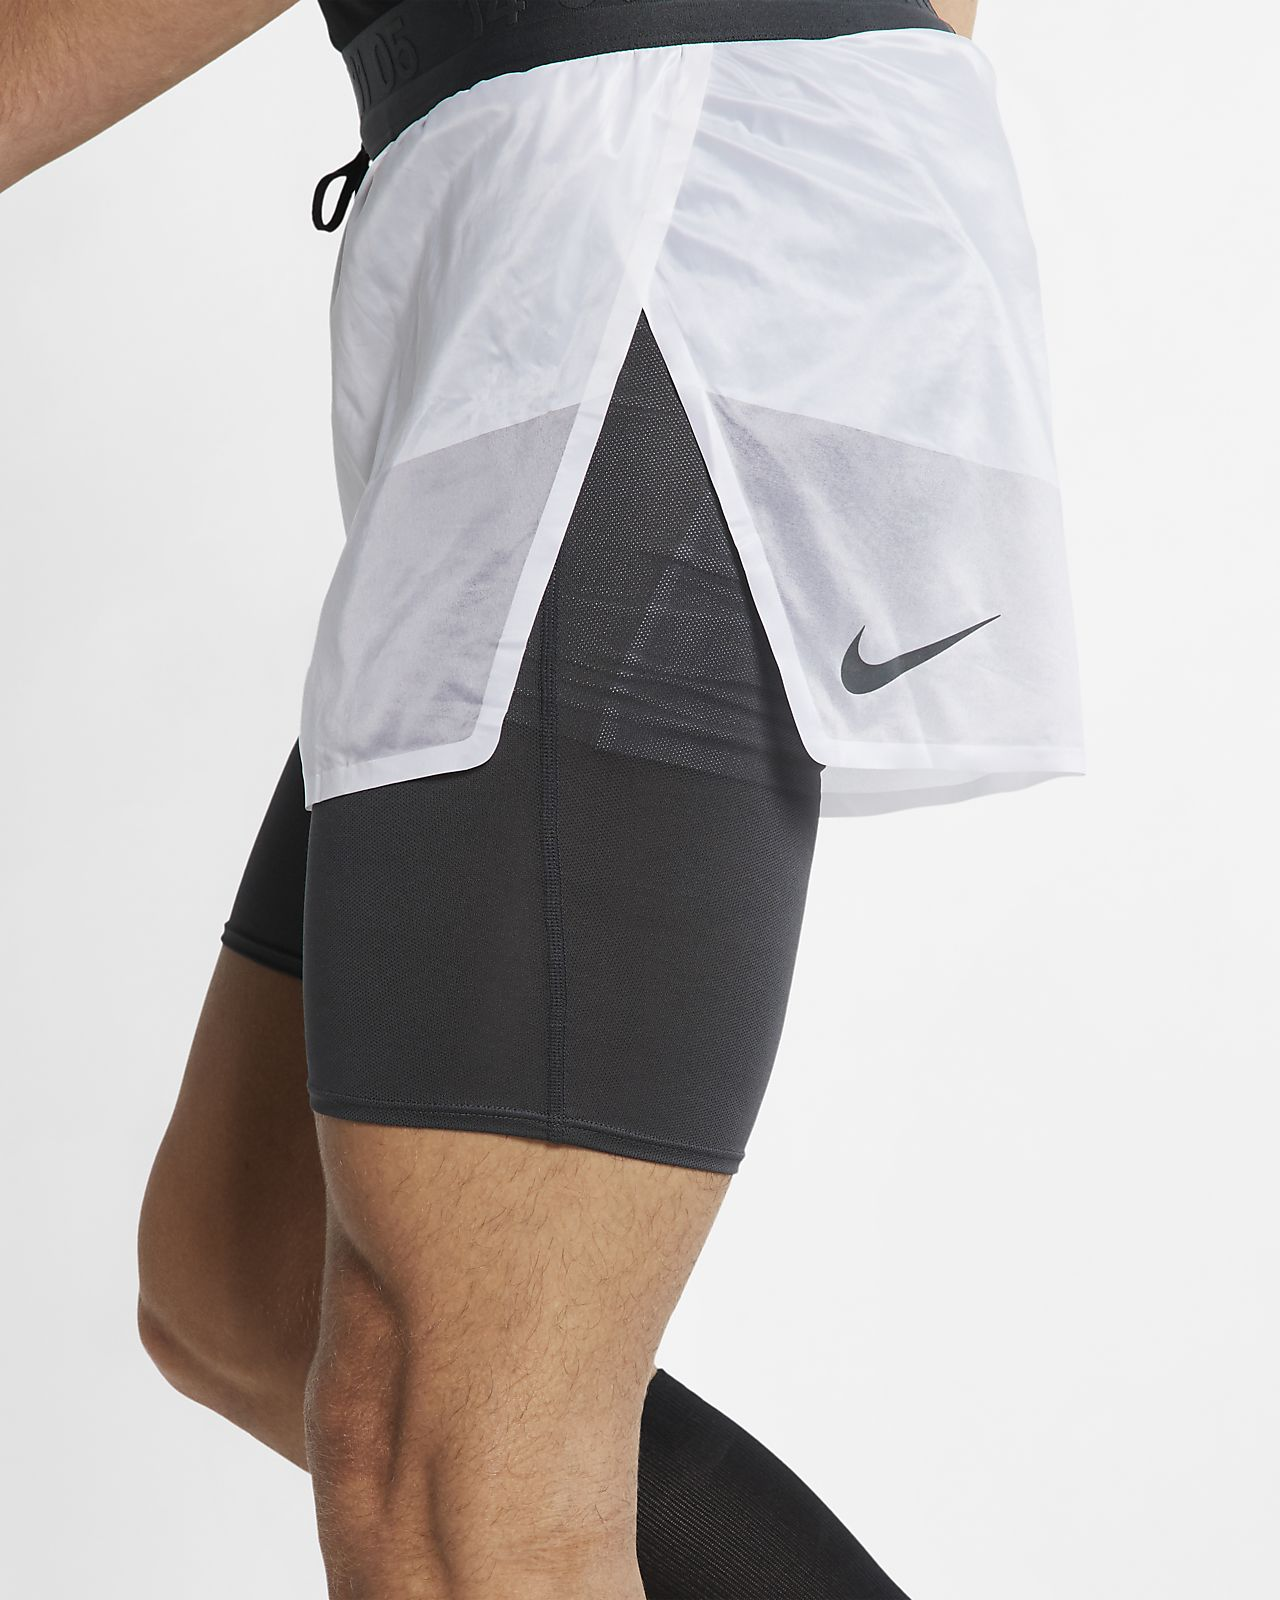 c3b03bb04e6ad Nike Tech Pack Men's 2-in-1 Running Shorts. Nike.com RO